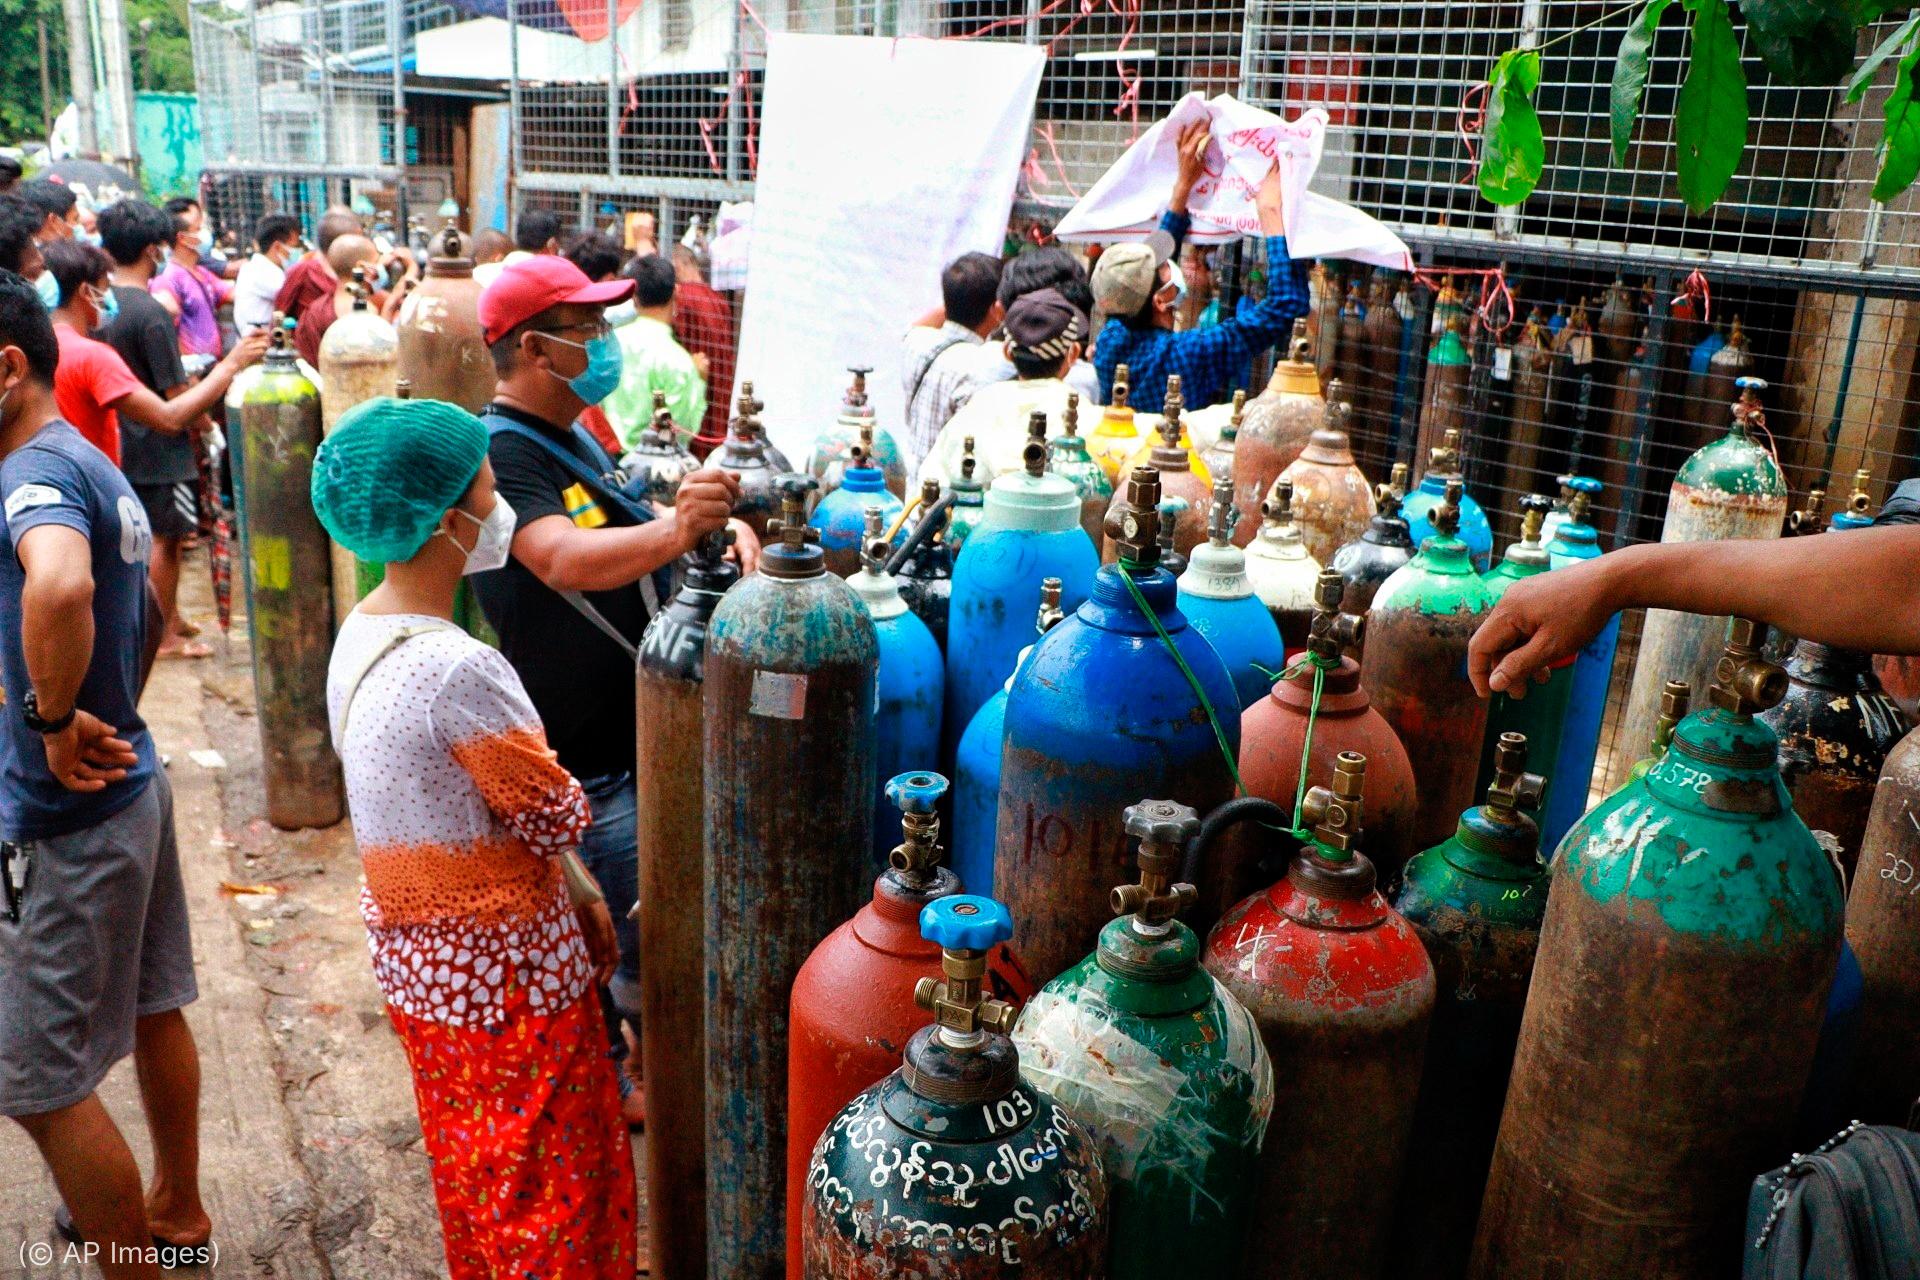 Personas reunidas en torno a tanques de oxígeno (© AP Images)